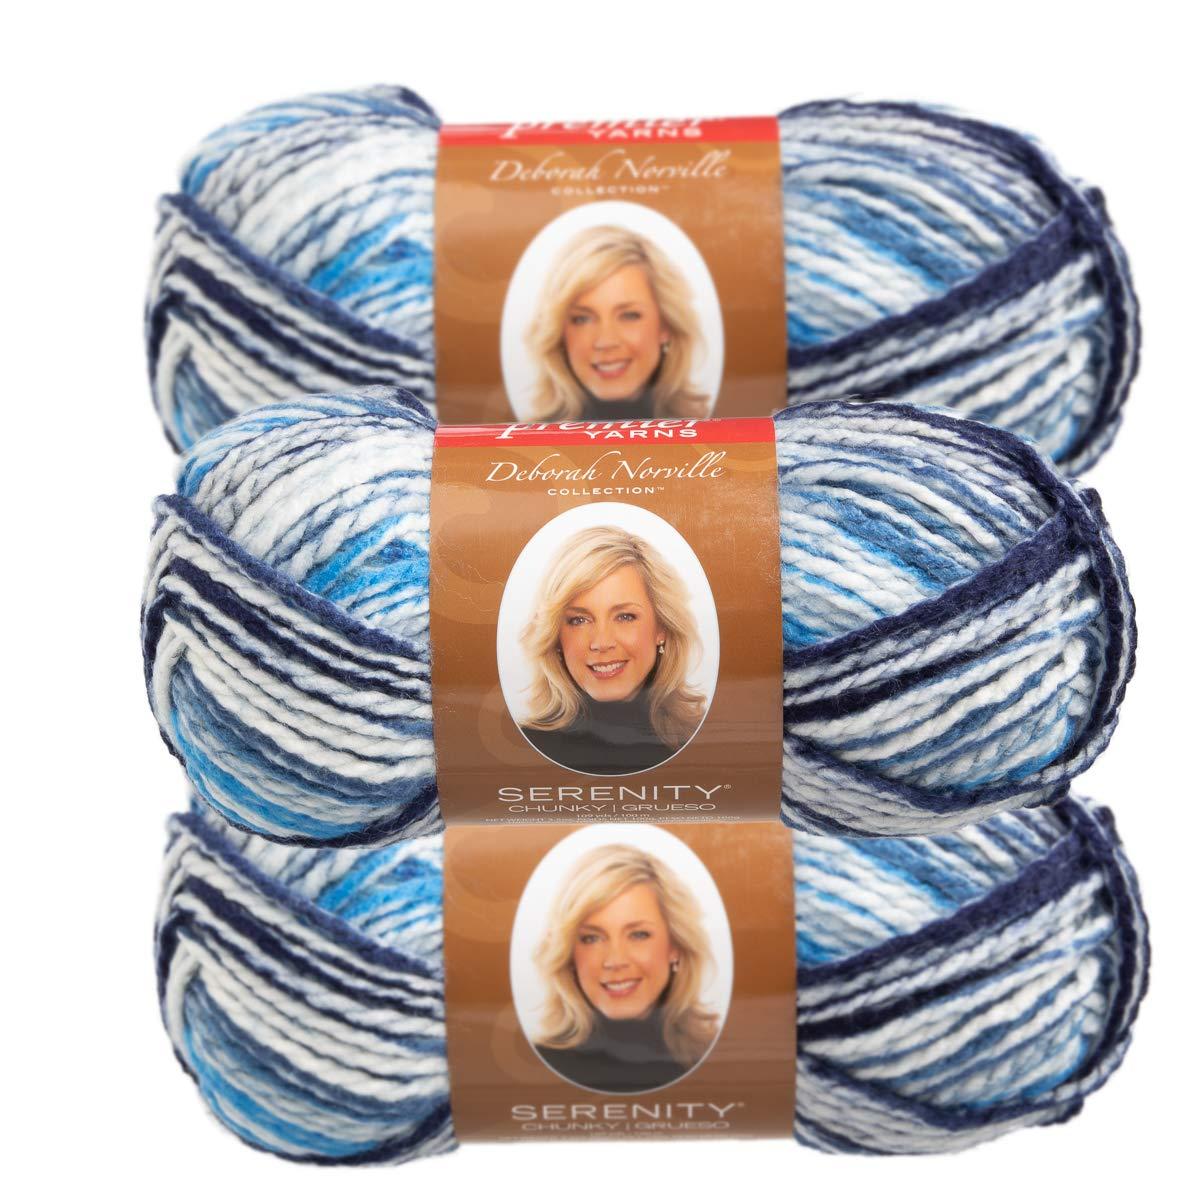 Premier Yarns (3 Pack Deborah Norville Serenity 100% Acrylic Soft Cirrus Light Blue Dark Blue White Yarn for Knitting Crocheting Chunky #5